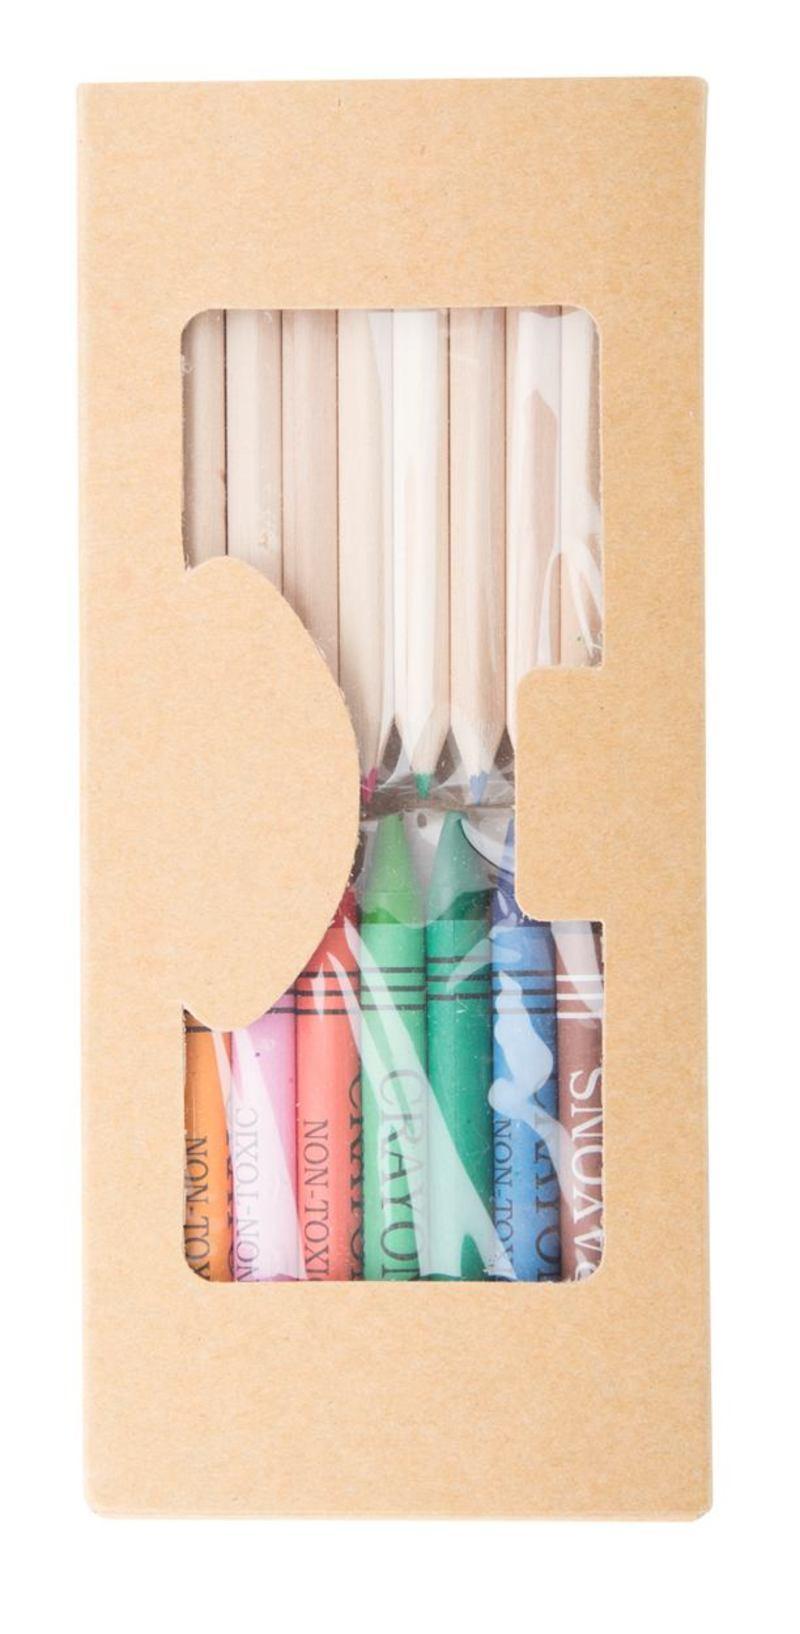 Aladin pencil and crayon set